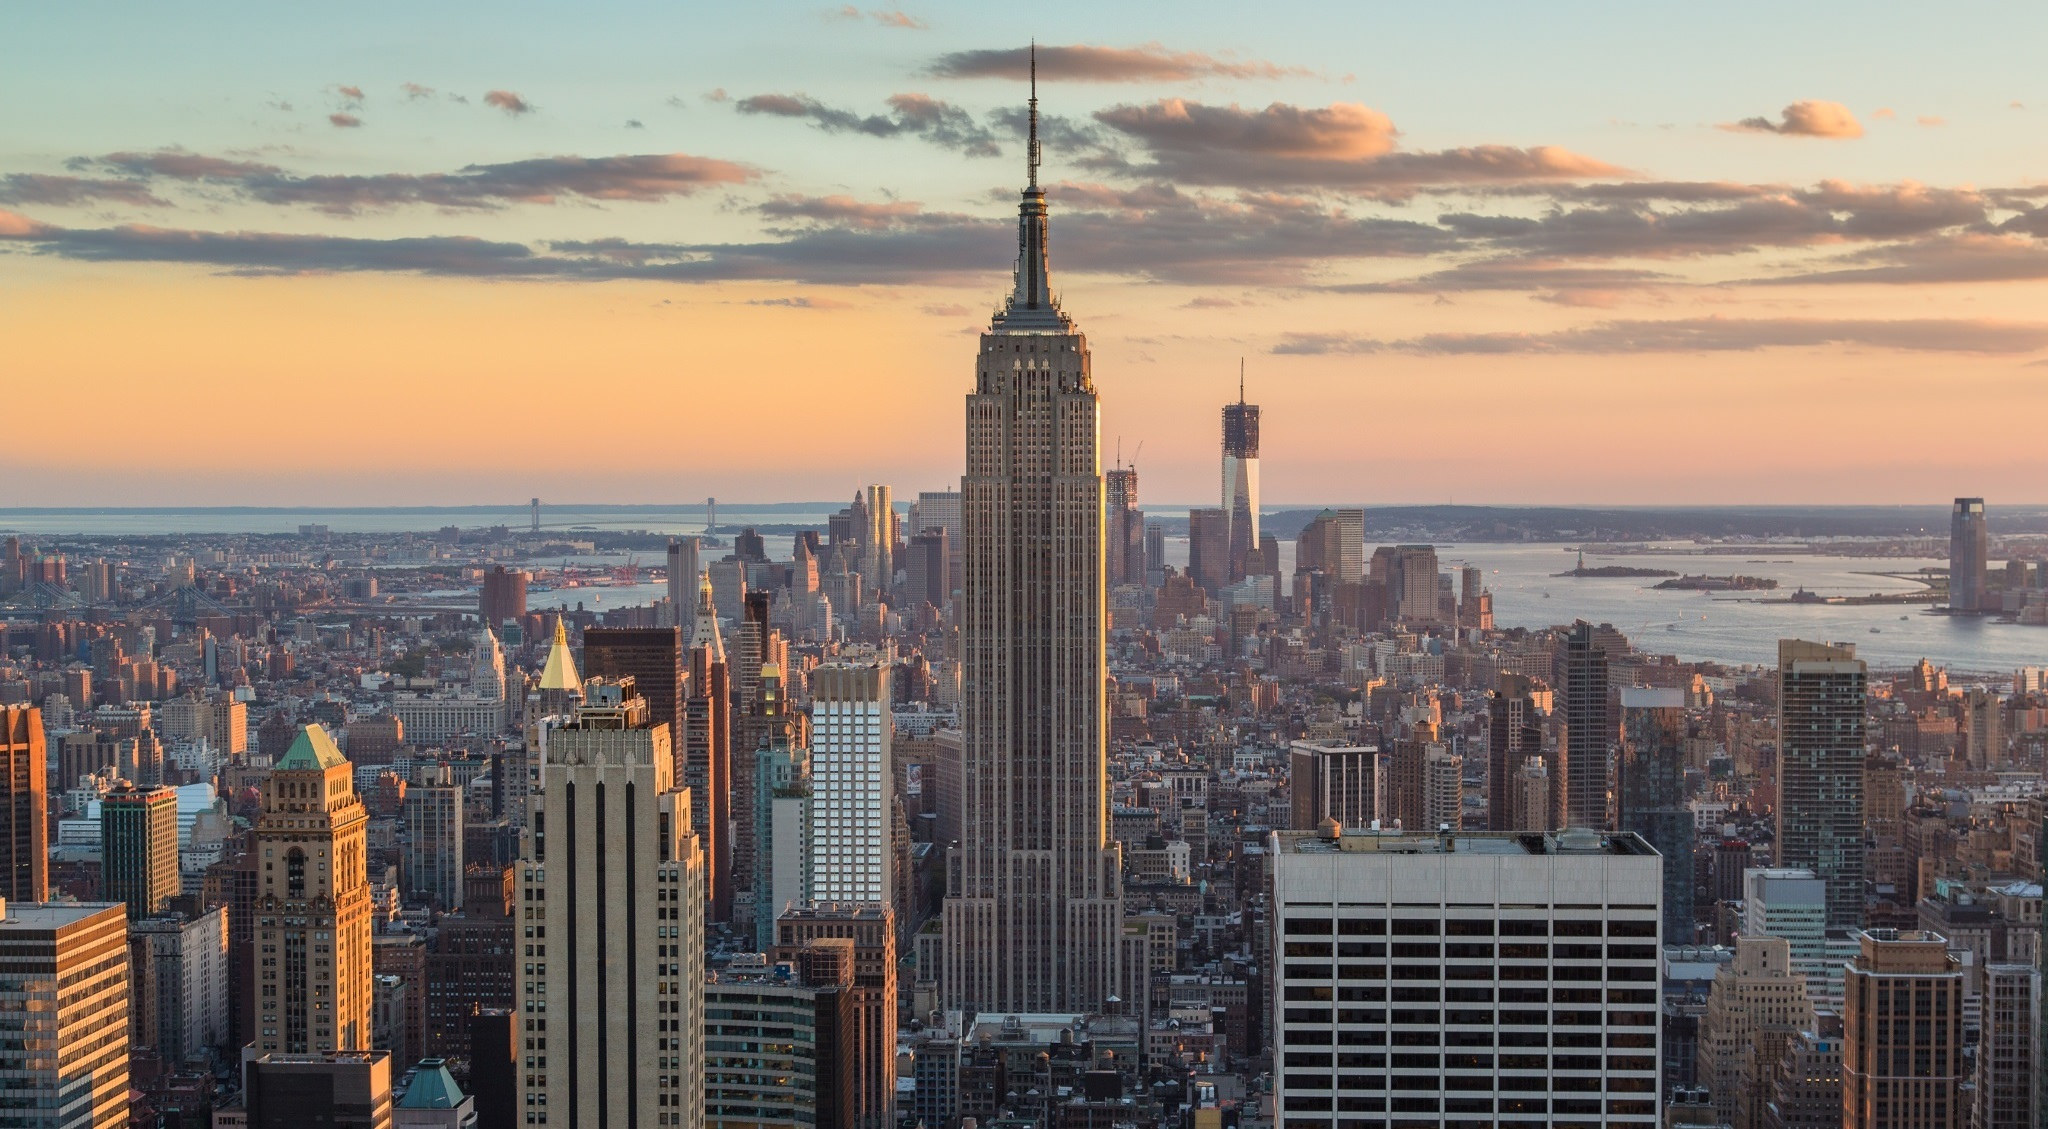 New York skyline from above by Sam Valadi, solar energy, green power, Yeloha